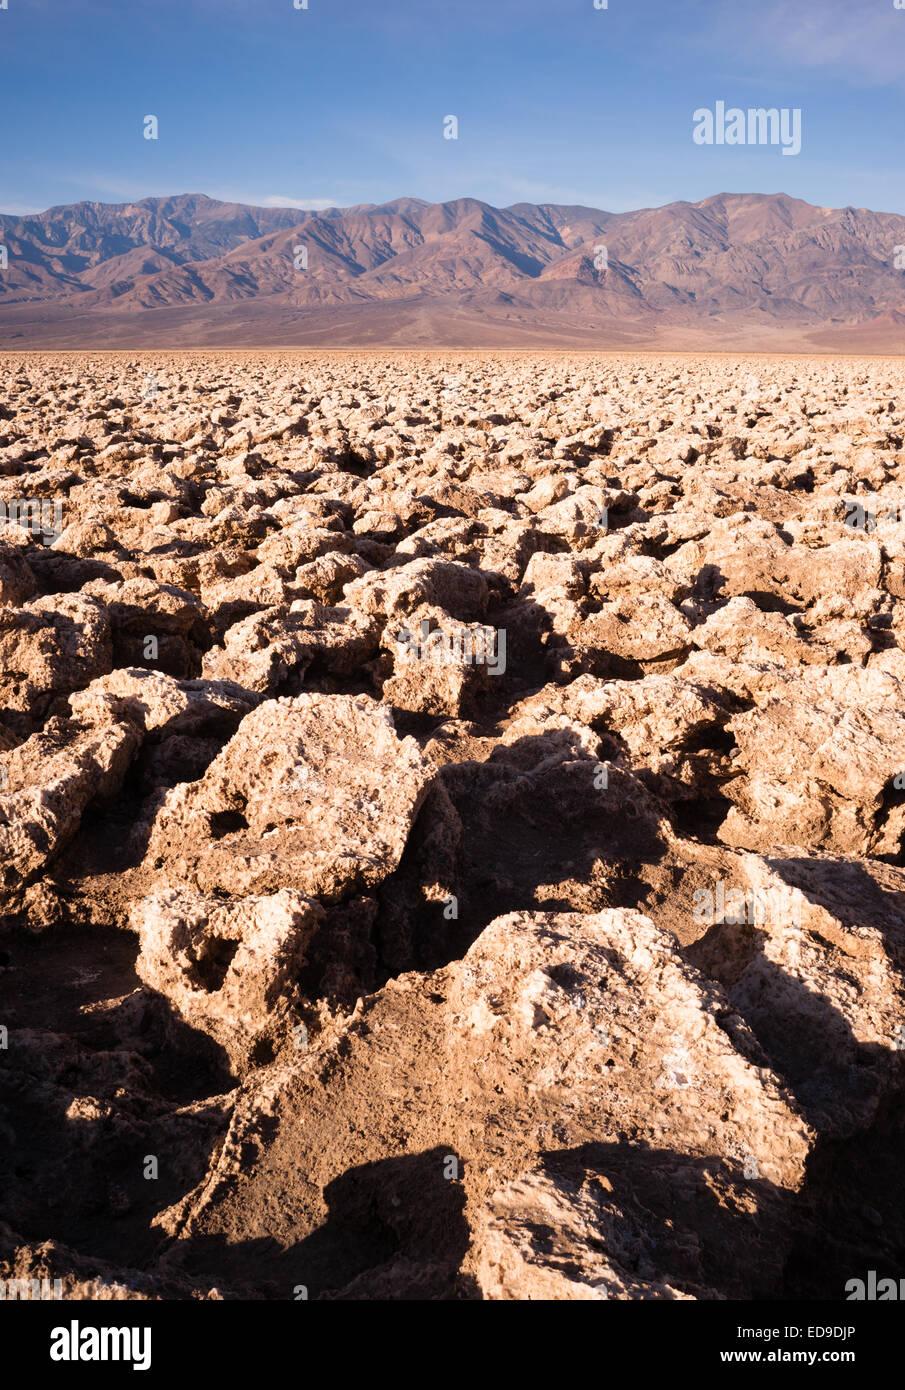 Walking through these basalt formations can be hazardous often resulting in broken bones - Stock Image